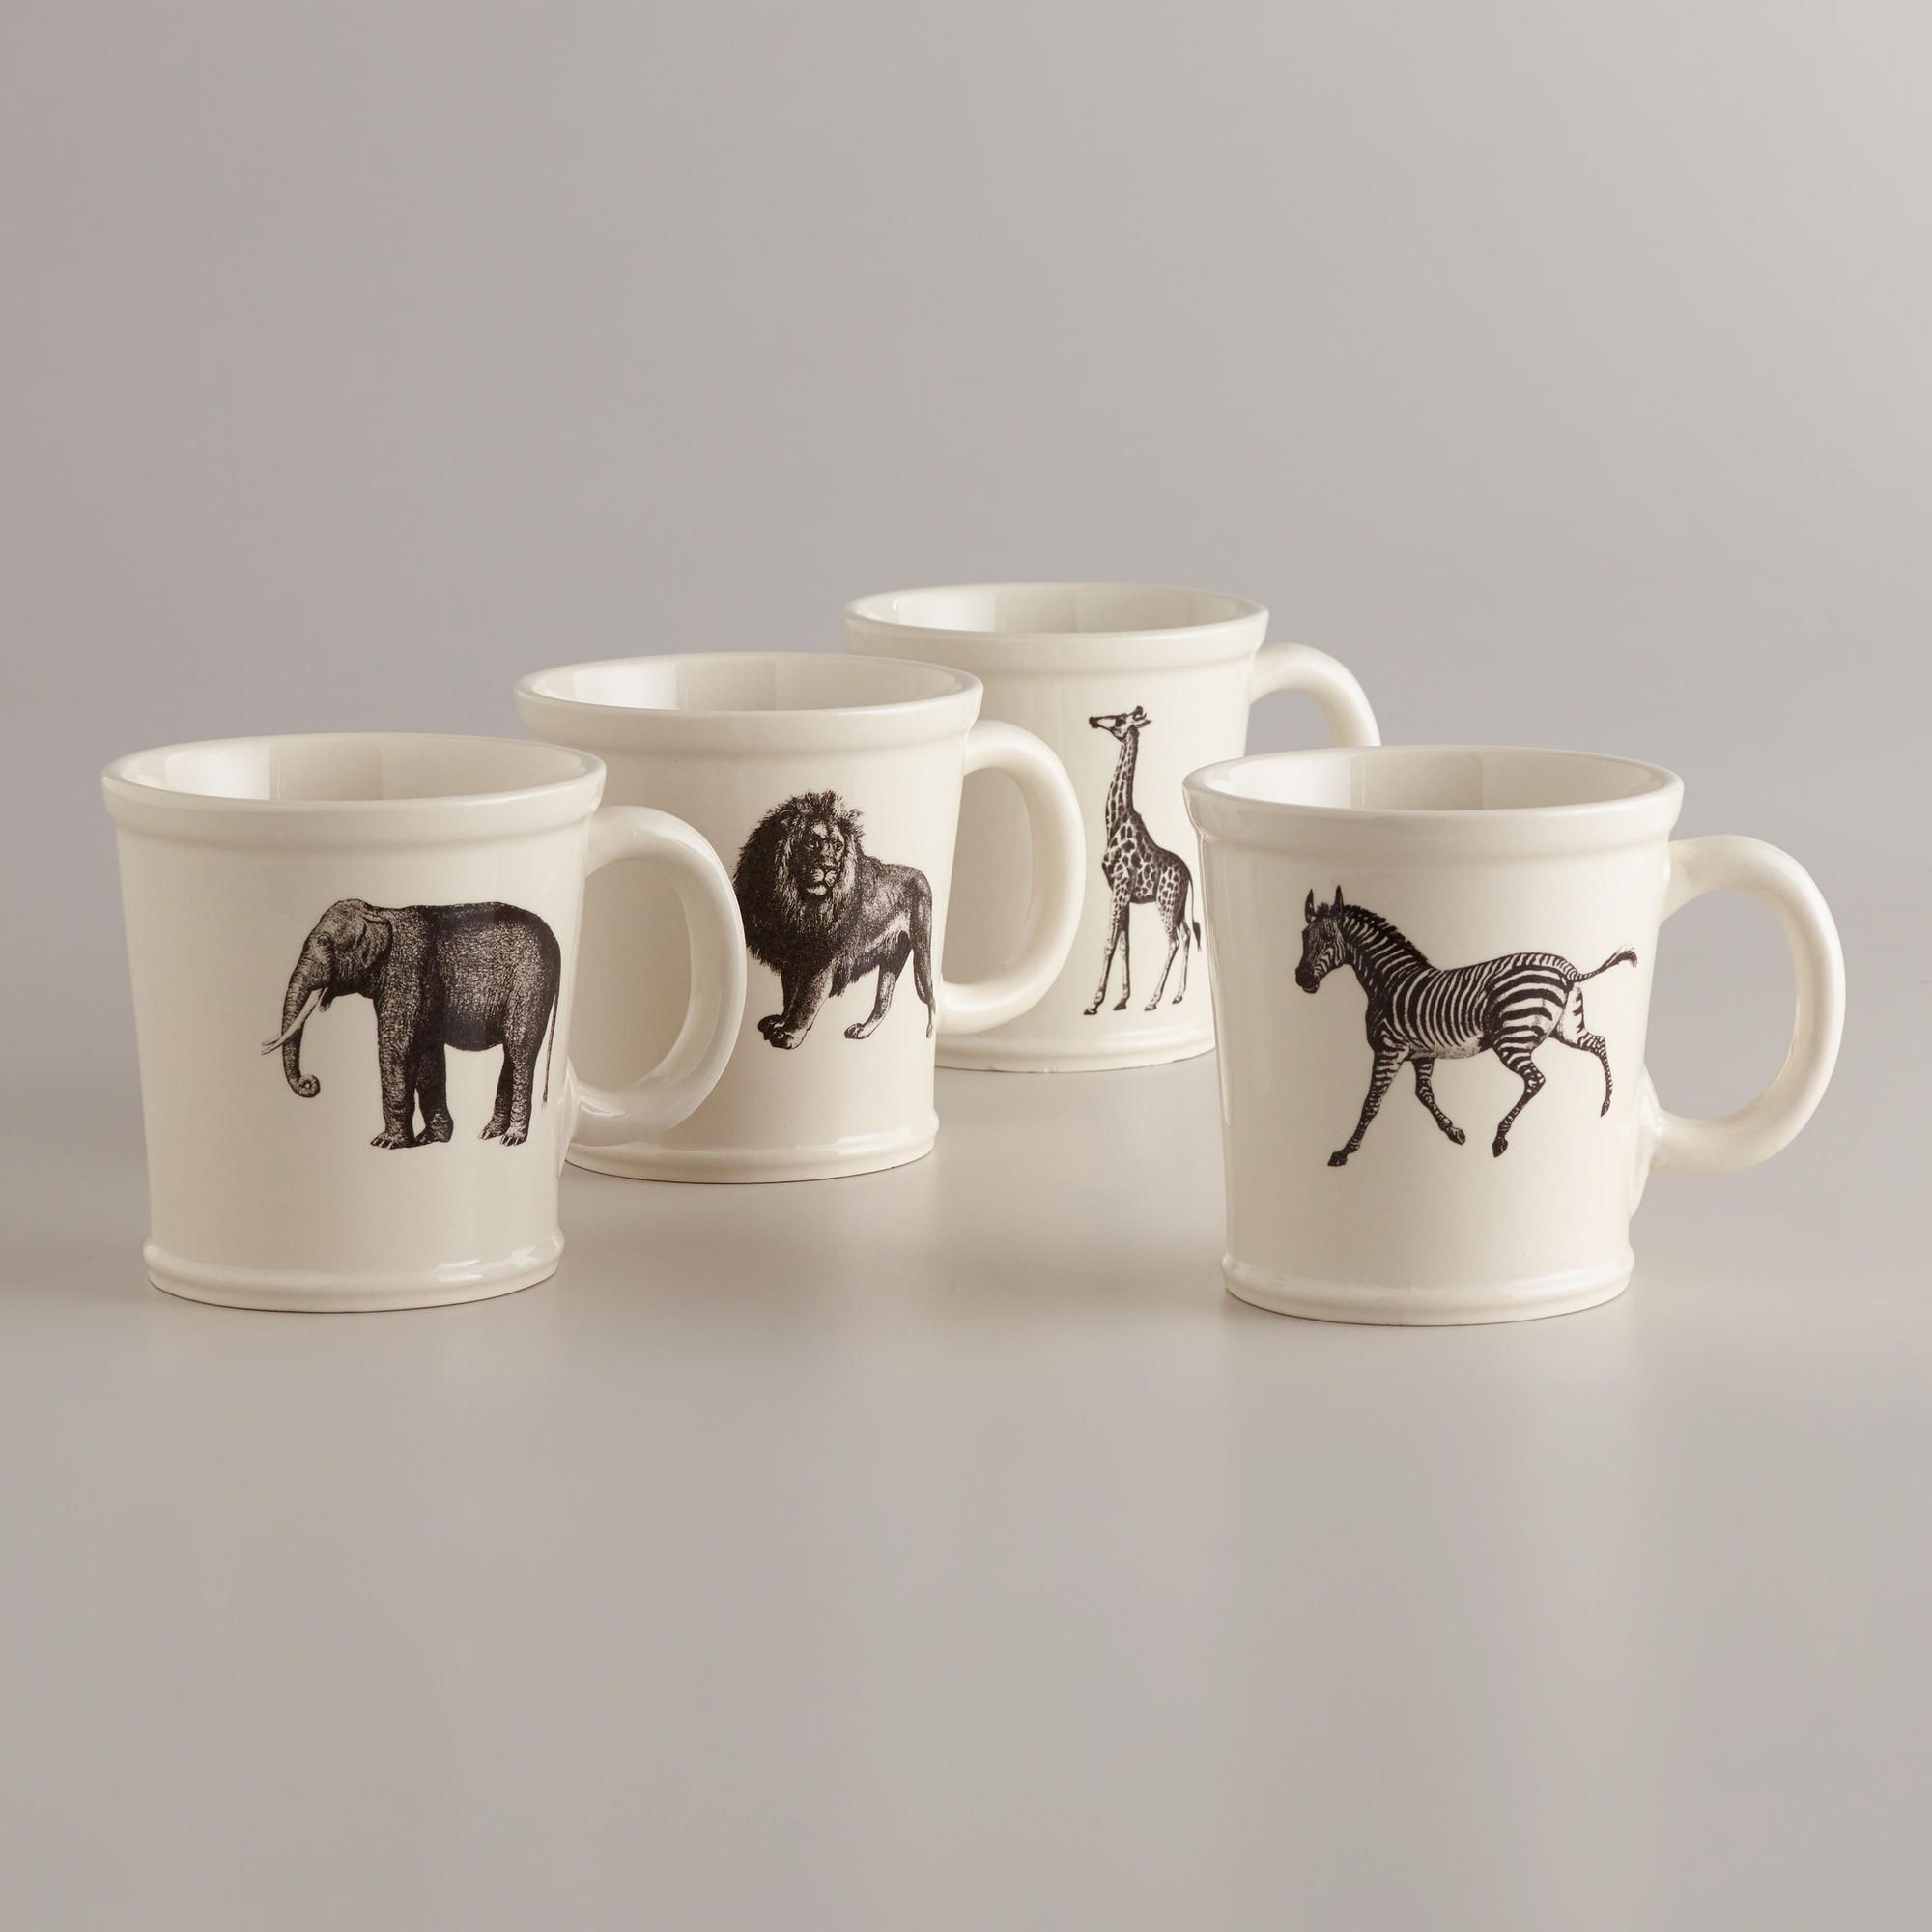 Animal Inspiration Mugs, Set of 4 World Market Mugs